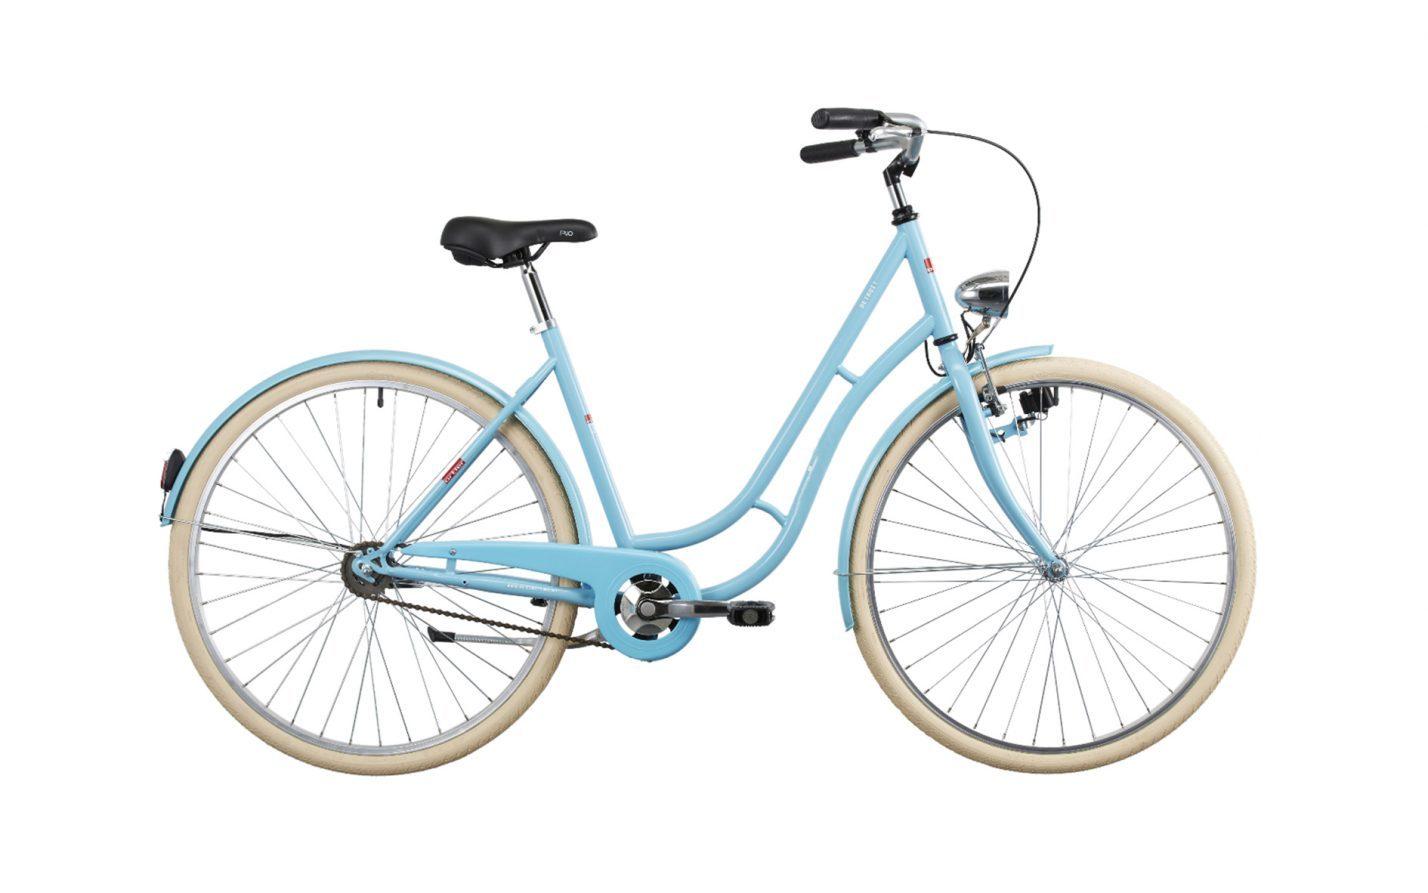 CITY BIKE Monomarcia - Noleggio city bike Pisa